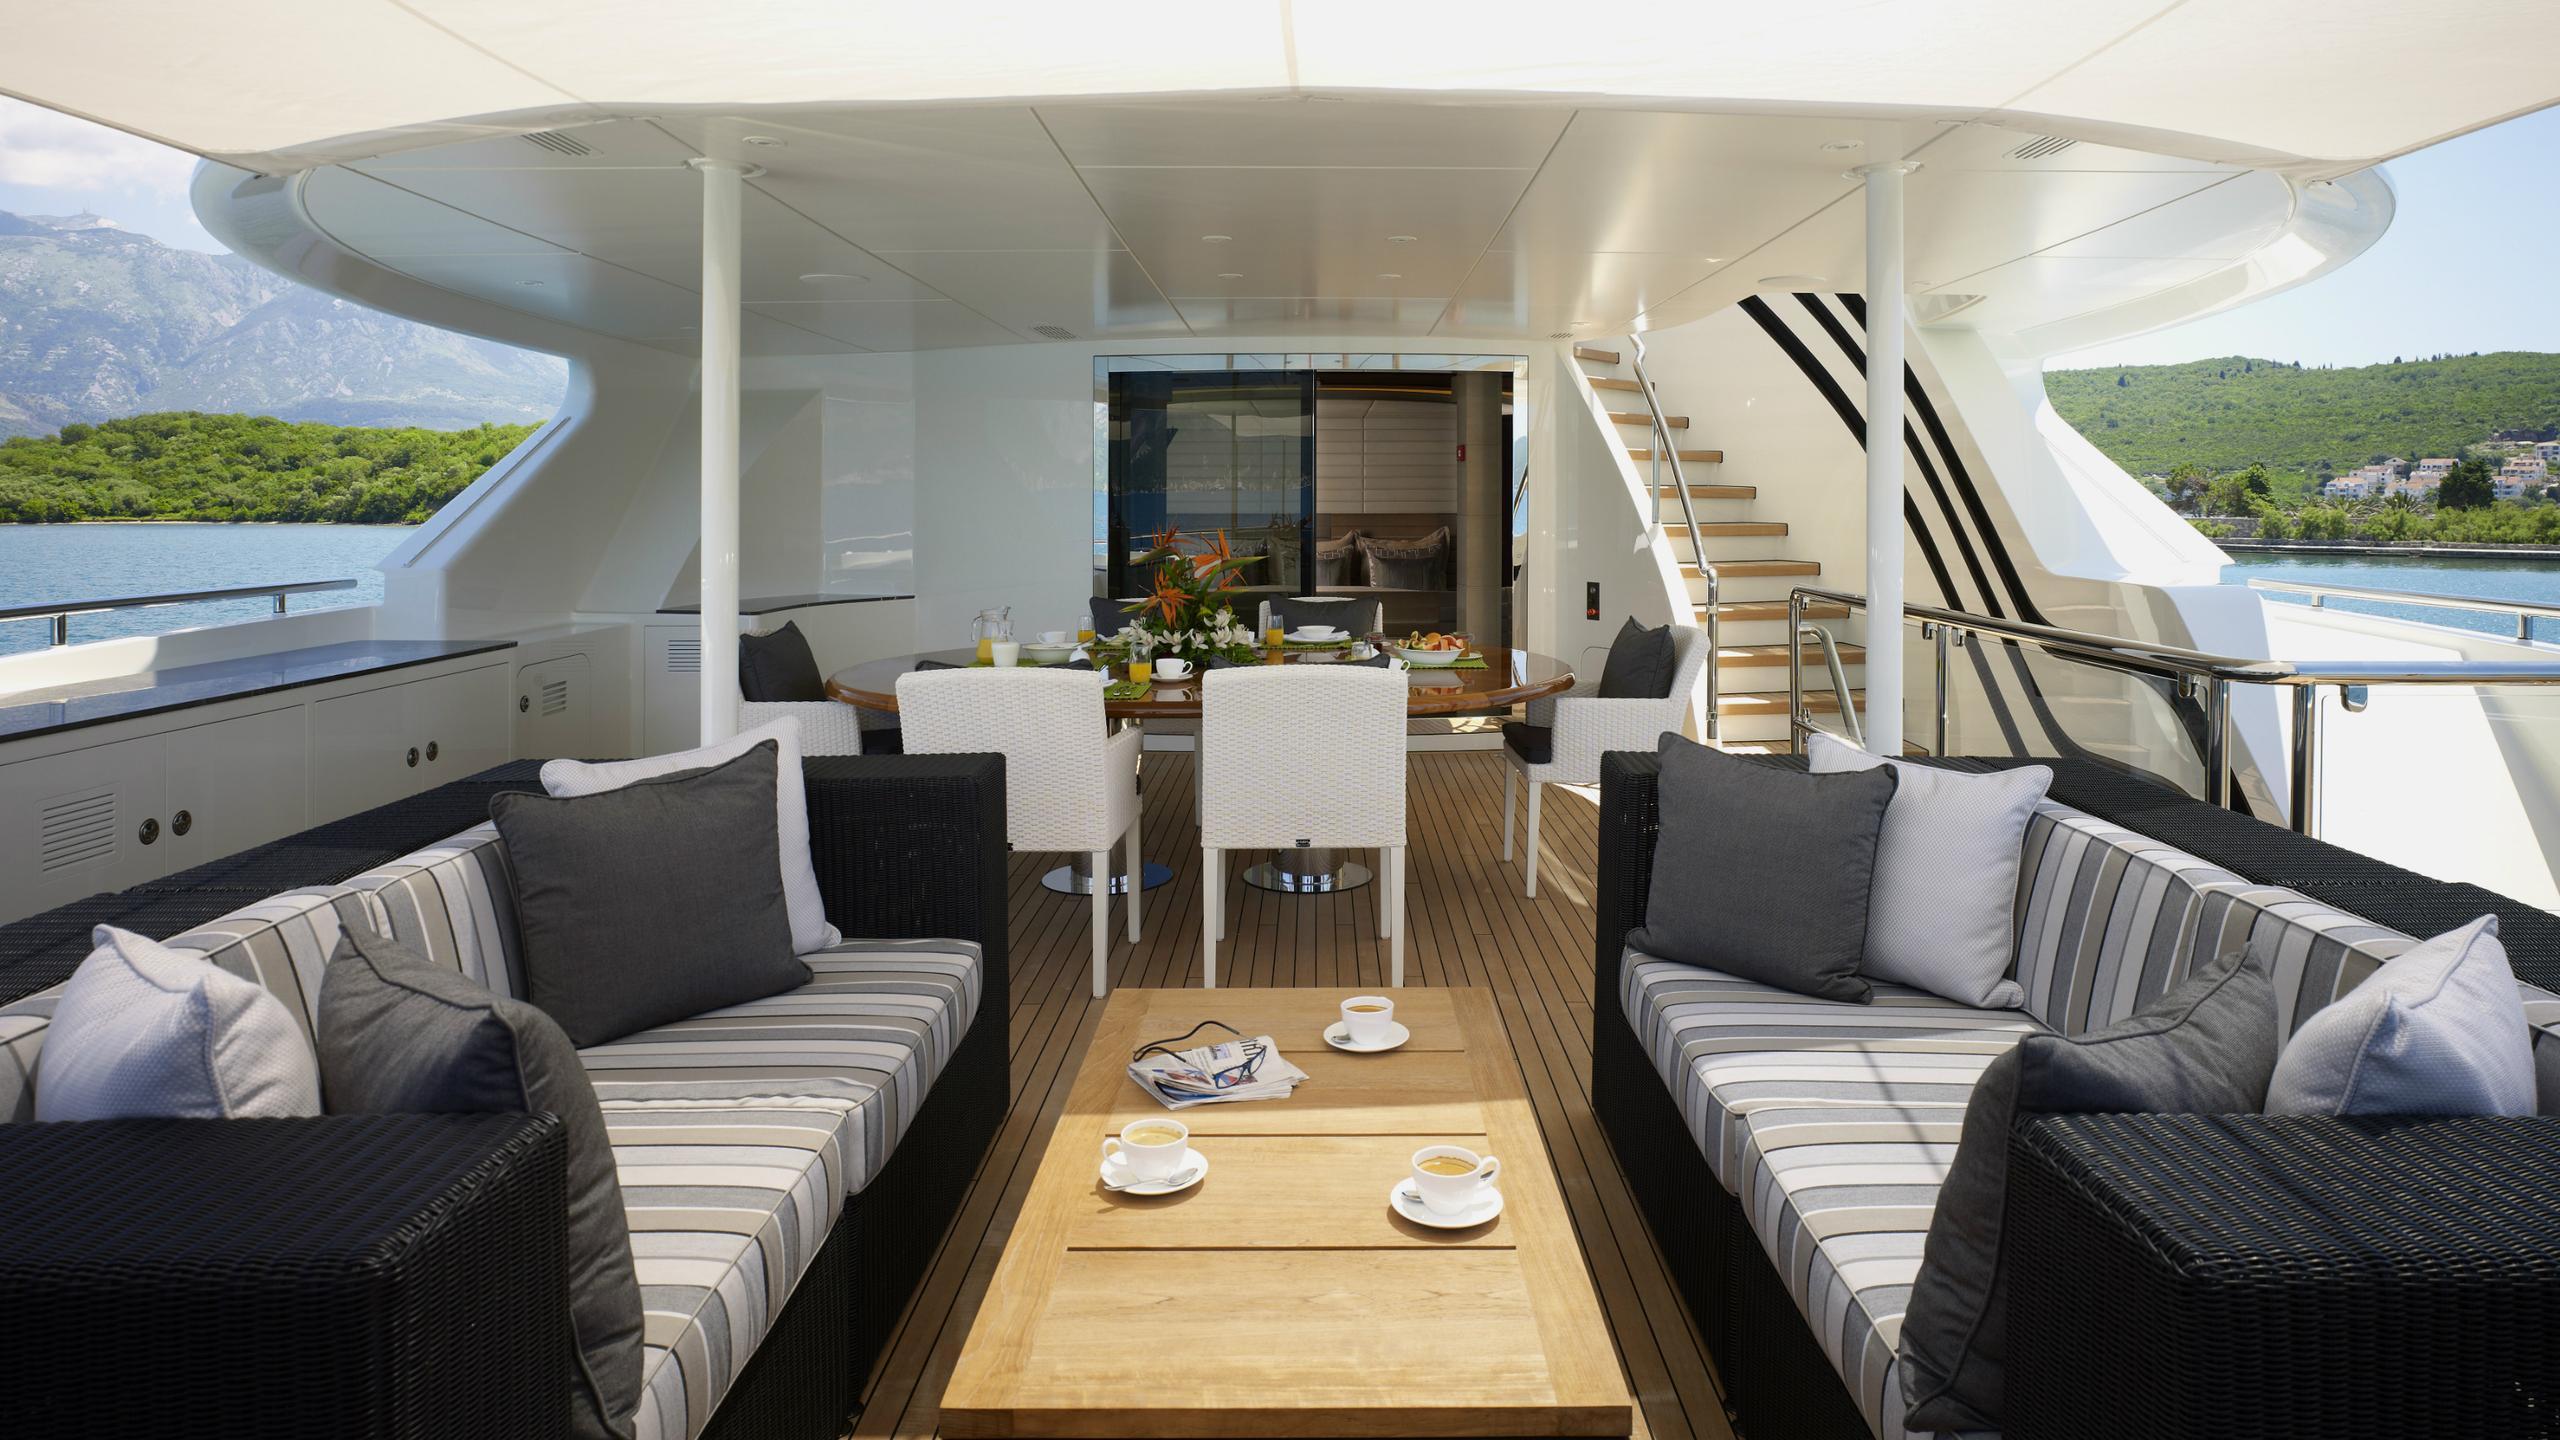 odyssea-como-lady-petra-motor-yacht-heesen-2012-47m-deck